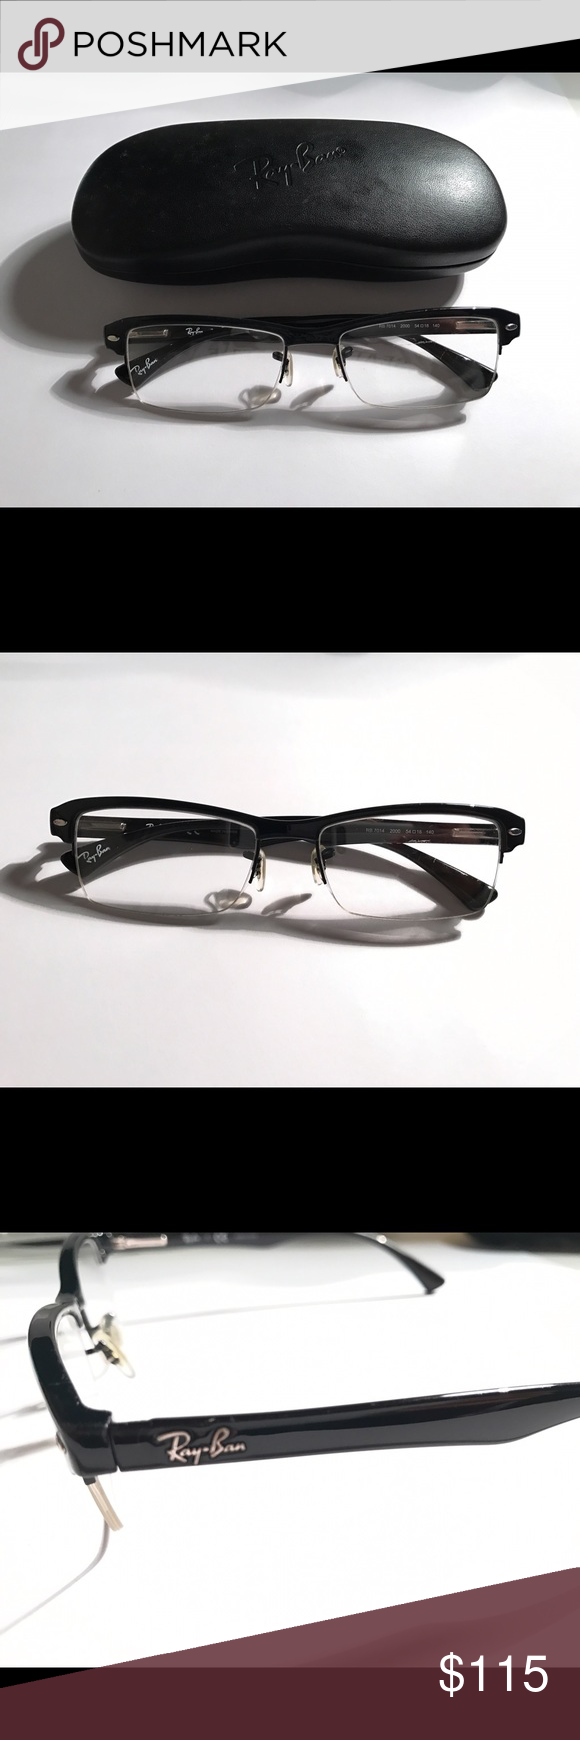 c41c9e68b54d7 Ray Ban Rx 7014 Eyeglasses « One More Soul